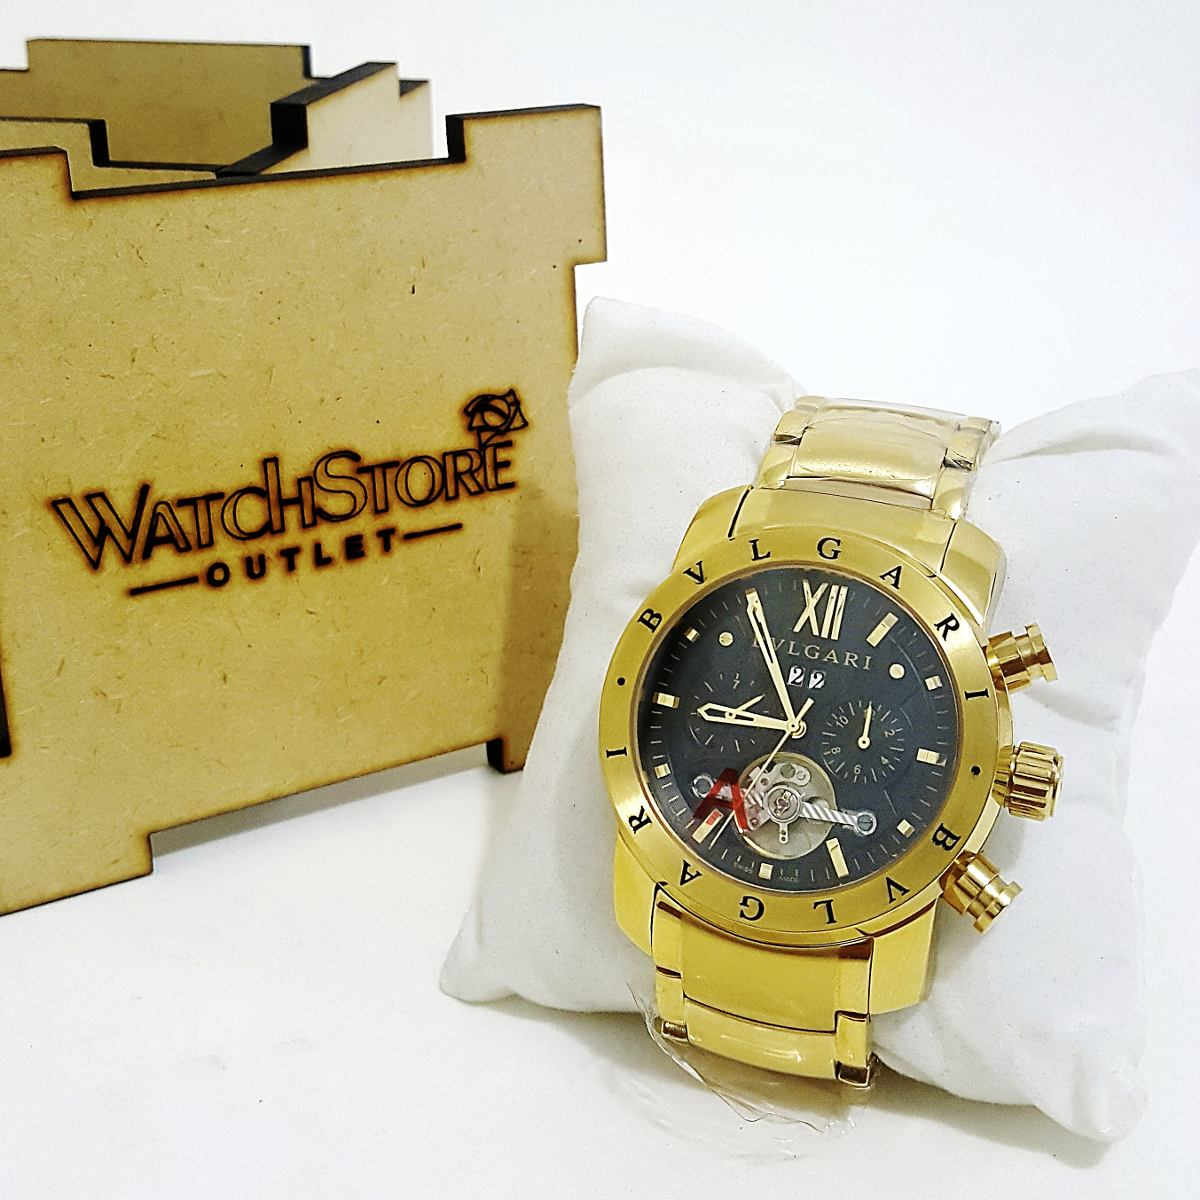 29f9bda6226 relógio bugari iron man automático dourado (novo). Carregando zoom.